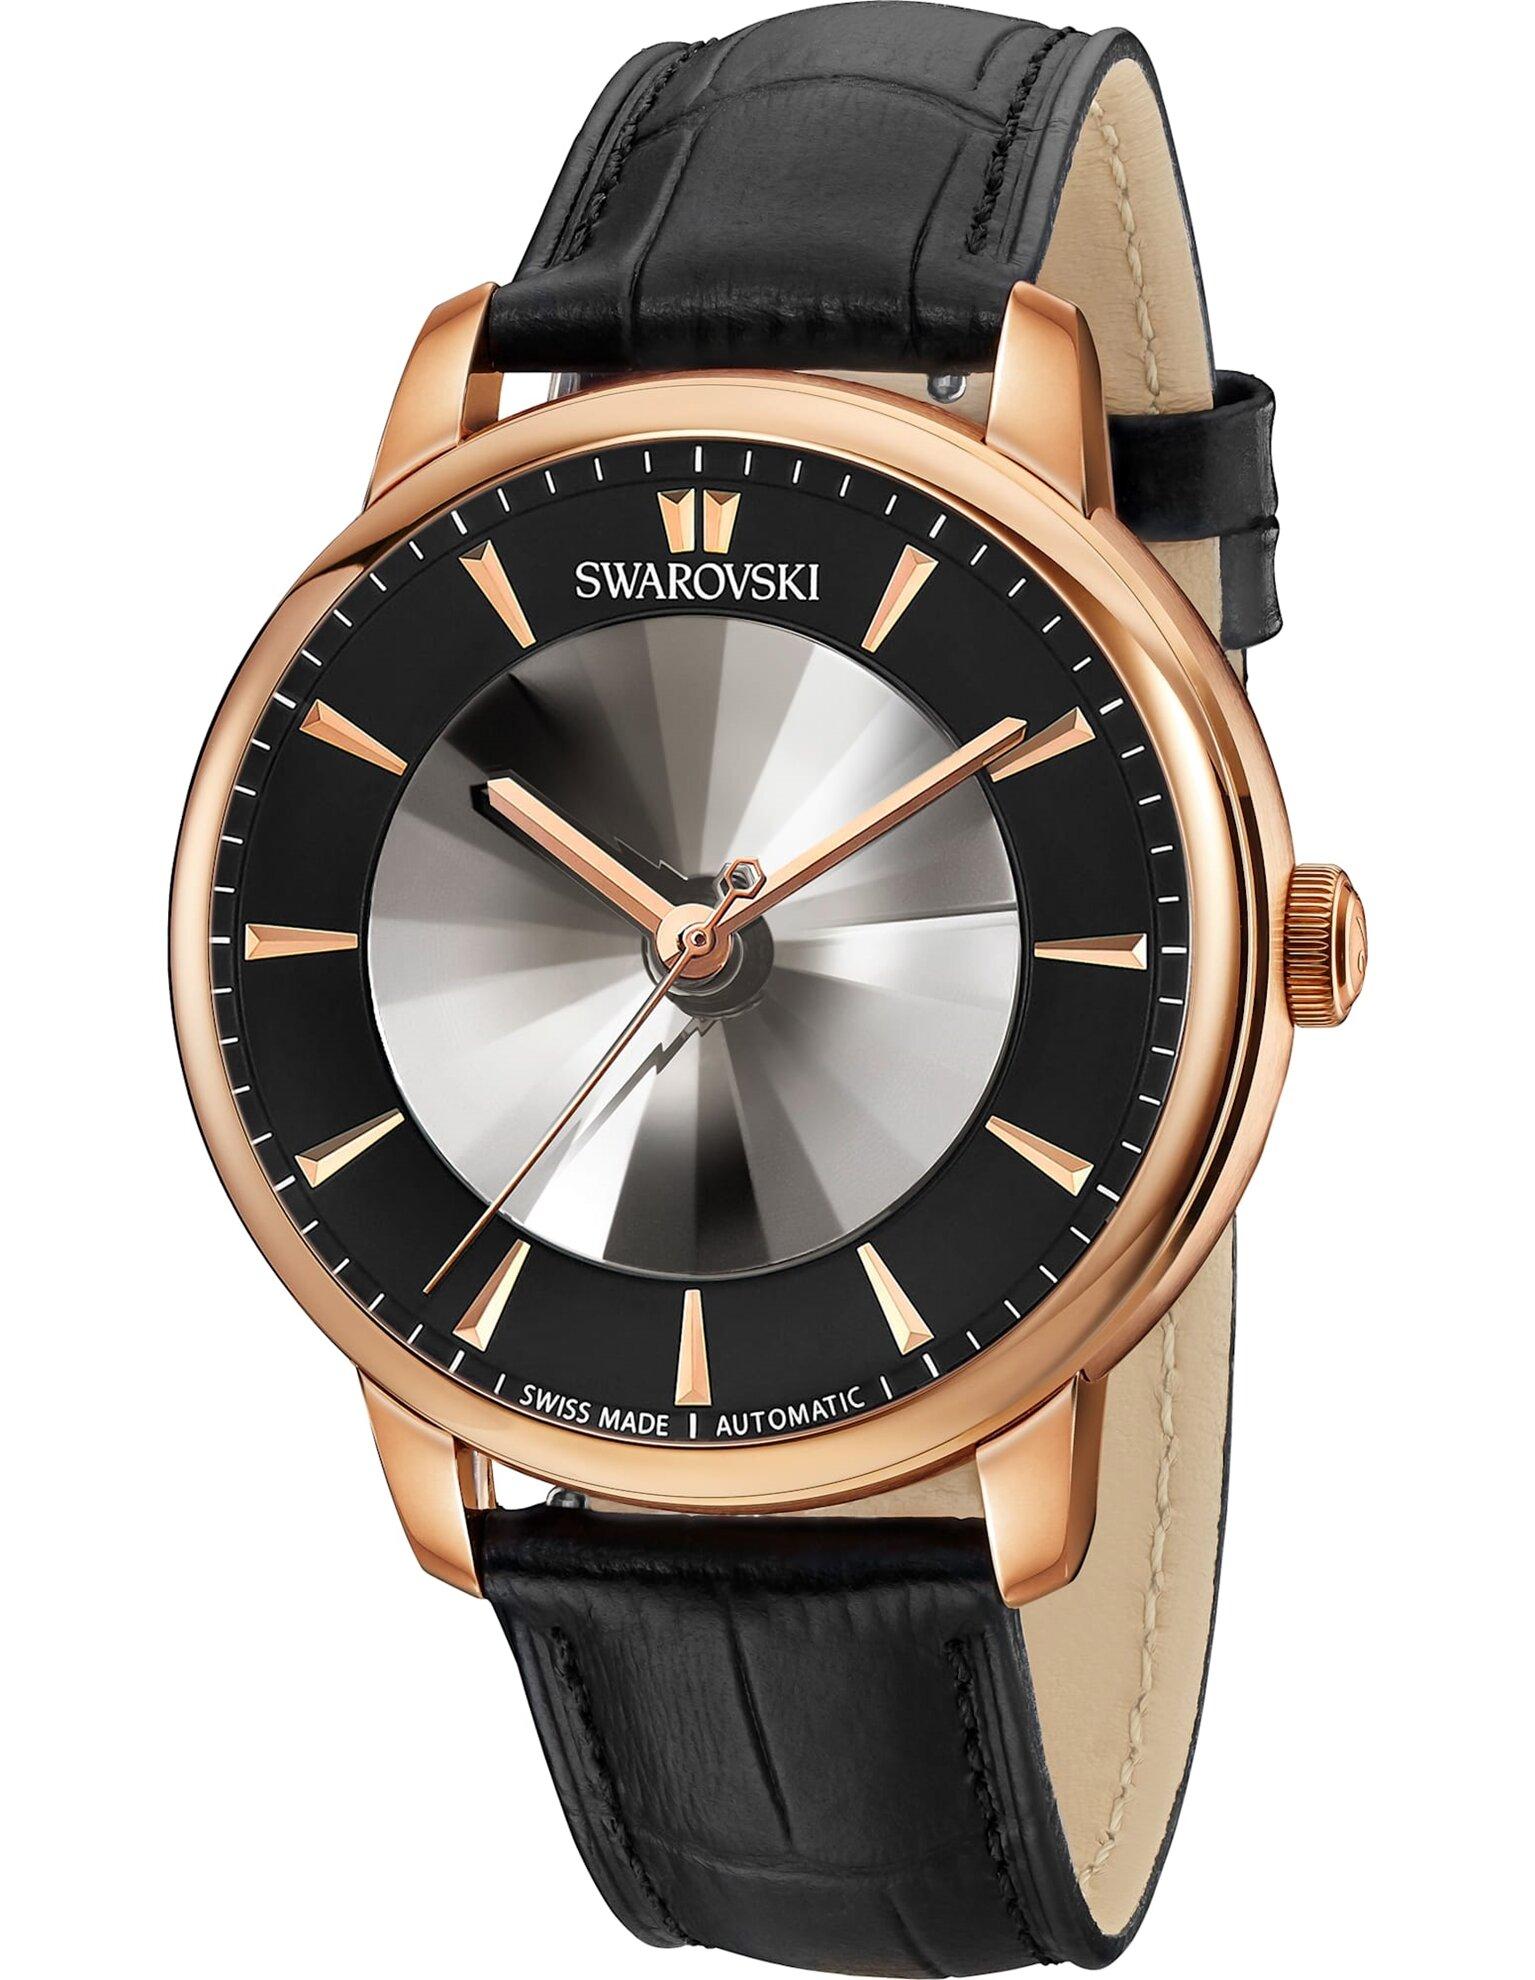 Picture of Atlantis Limited Edition Automatic Men's Saat, Siyah, Pembe altın rengi PVD